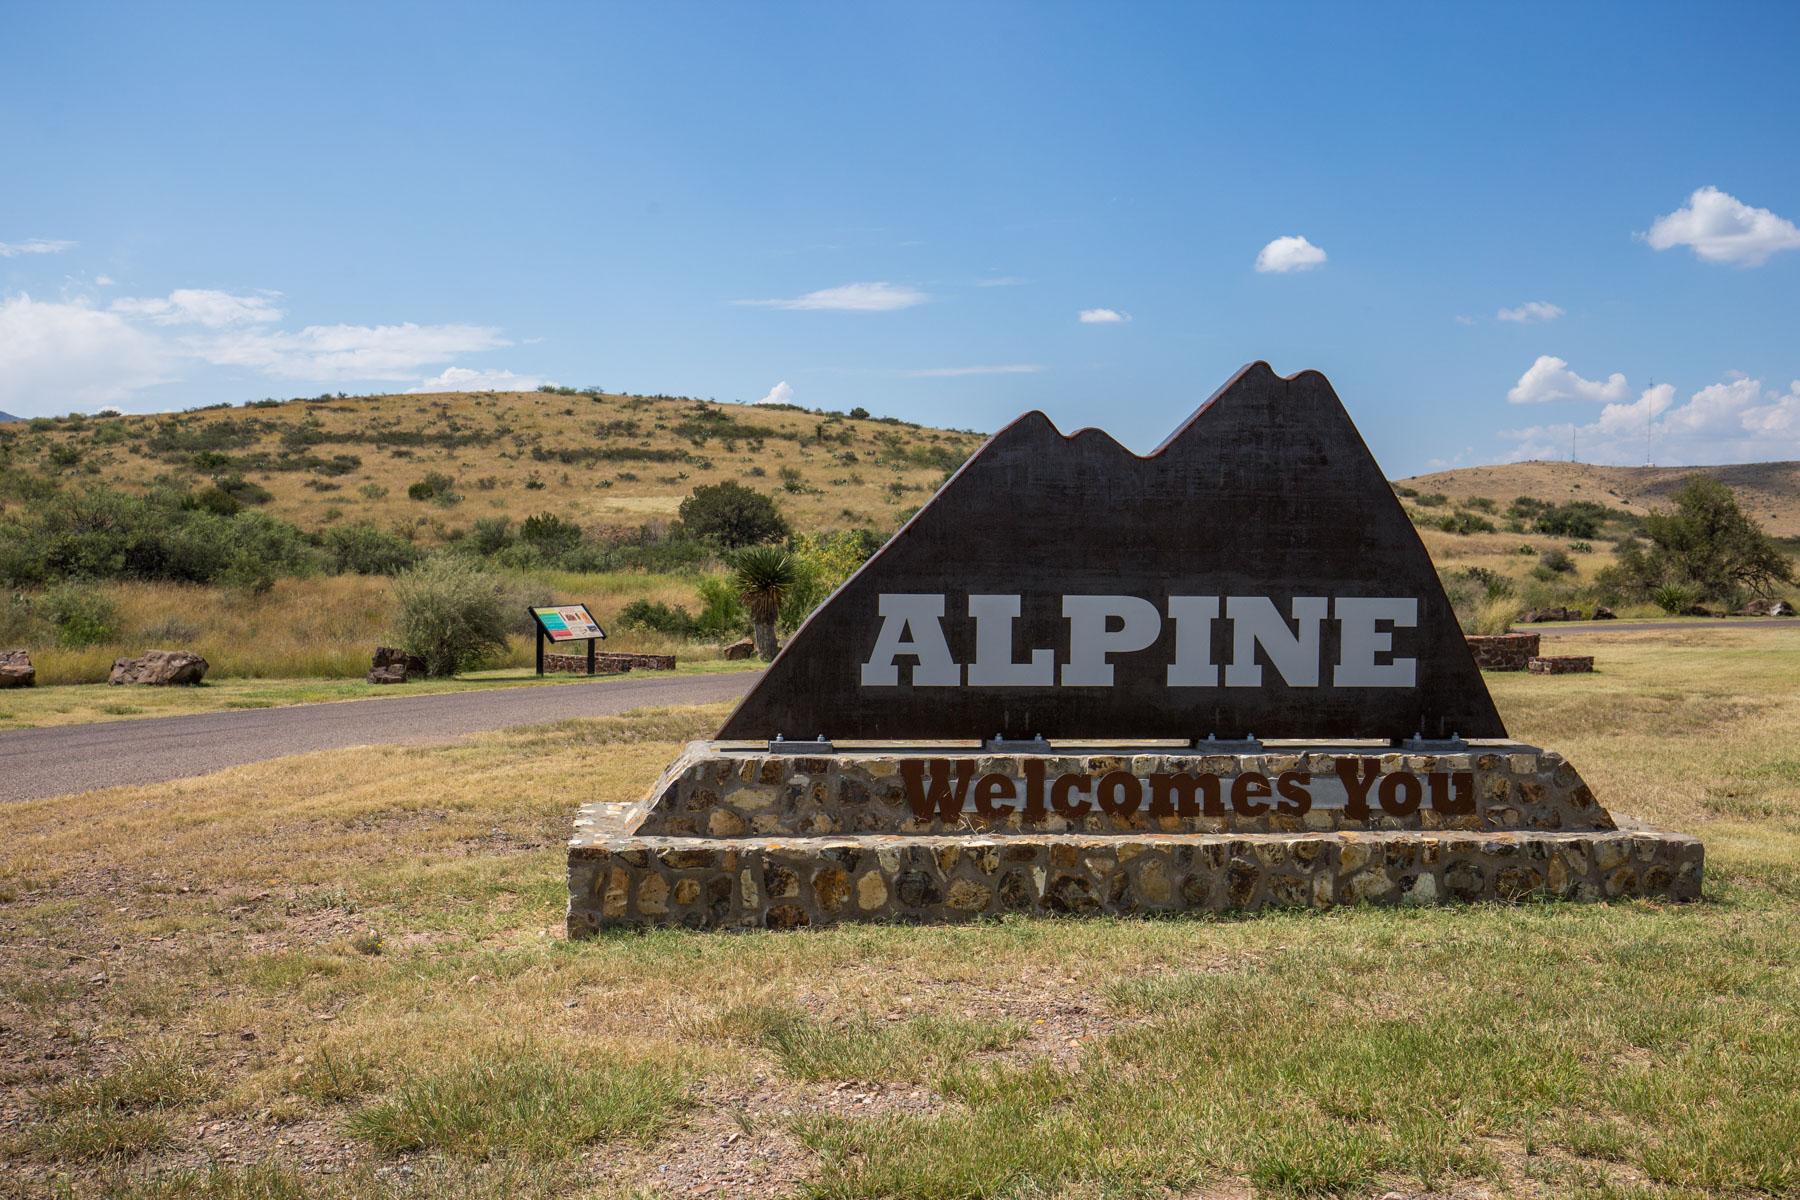 Land for Sale at Sierra la Rana 15 S Scenic Ridge Drive, Alpine, Texas, 79830 United States